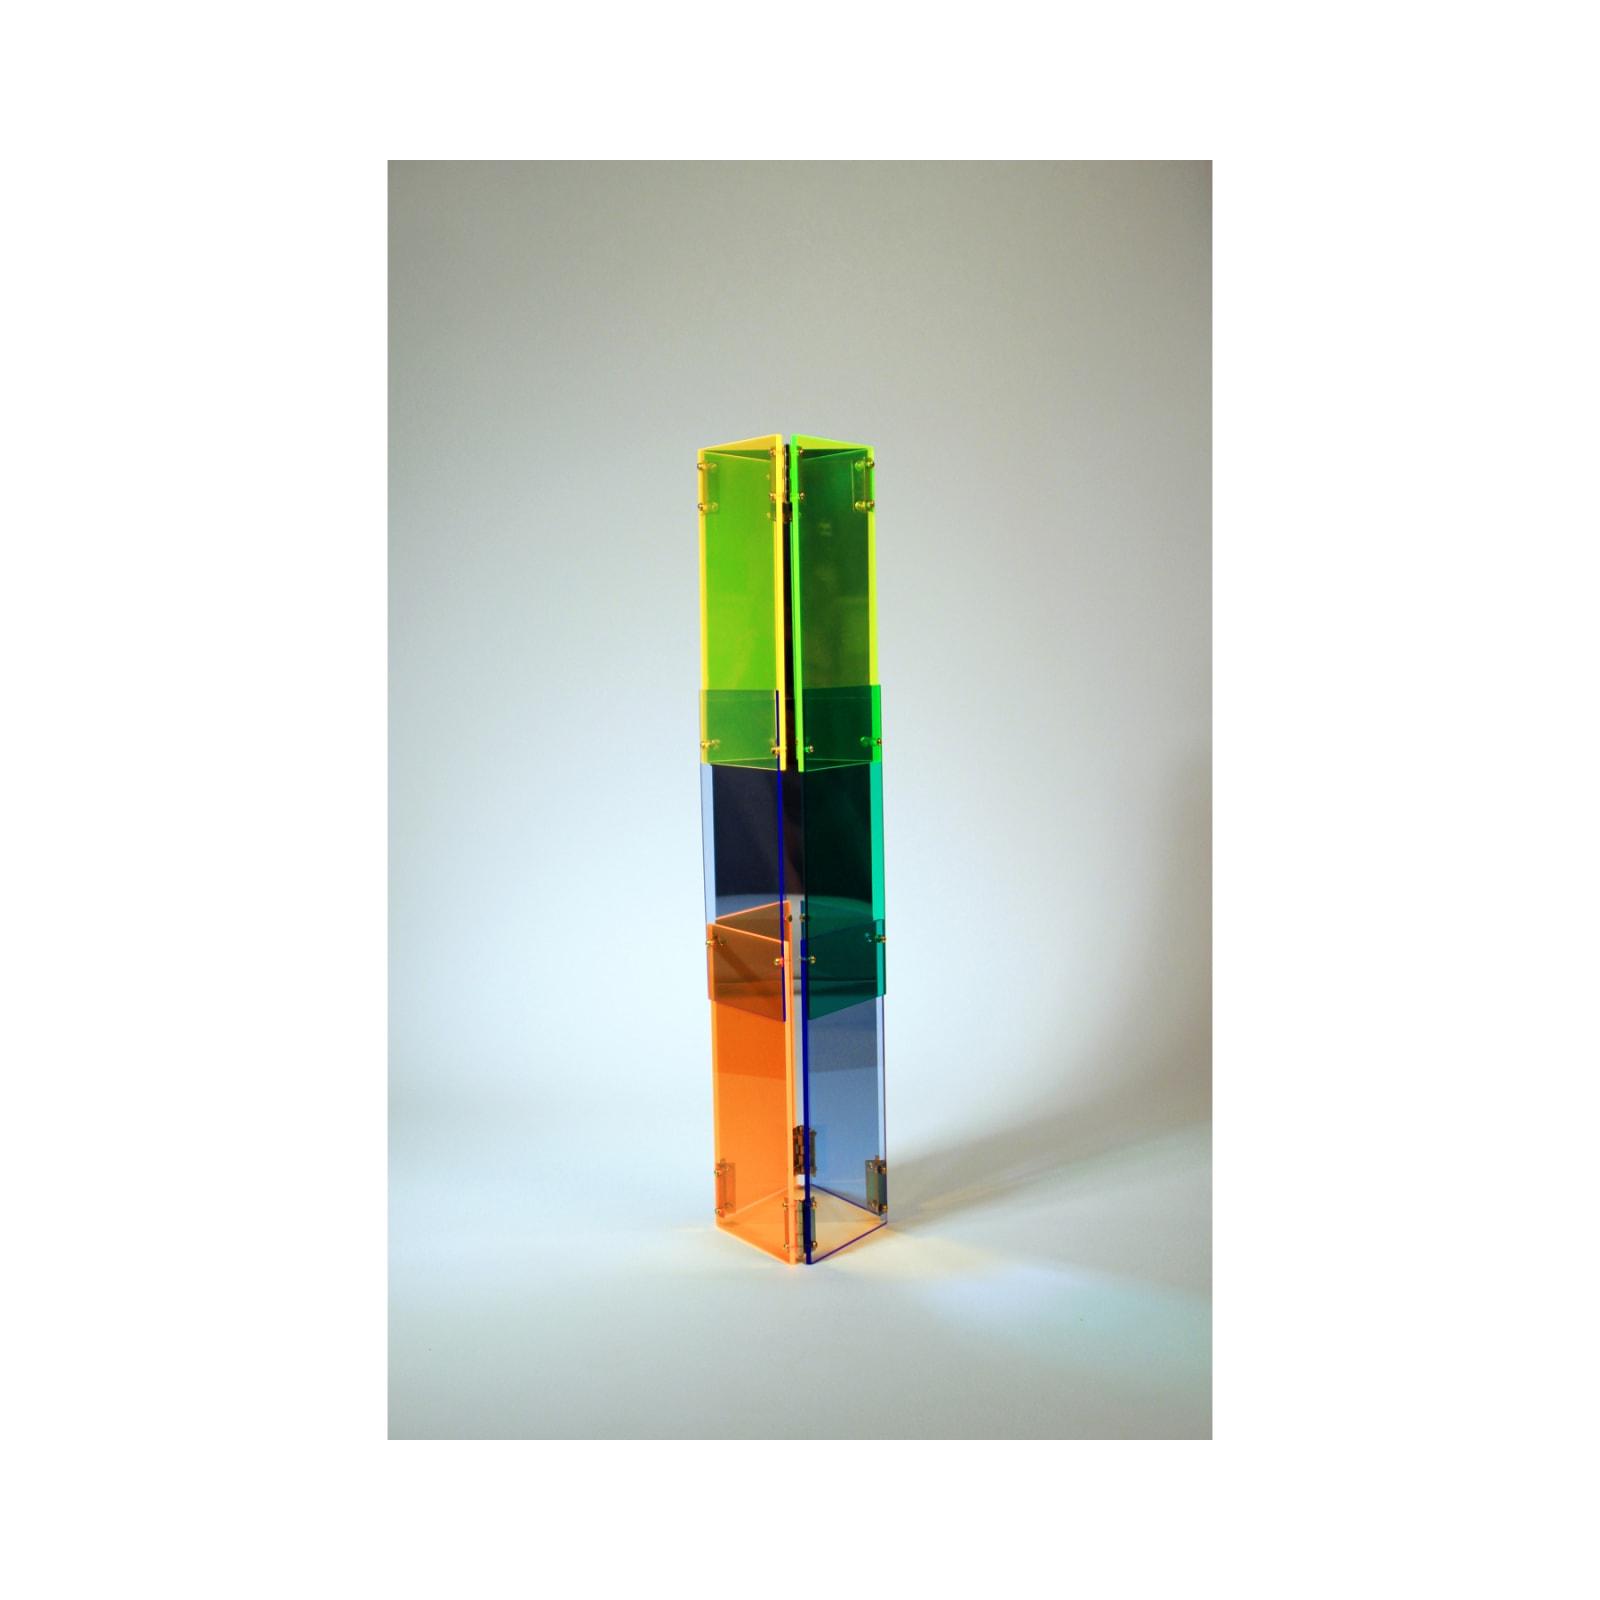 Anne Katrine Senstad  Babel 04, 2020  Lucite/Plexiglas, mirrors, brass door hinges, brass screws, bolts and washers  30 x 7 x 8 in  76.2 x 17.8 x 20.3 cm  Series: Circle of Babel